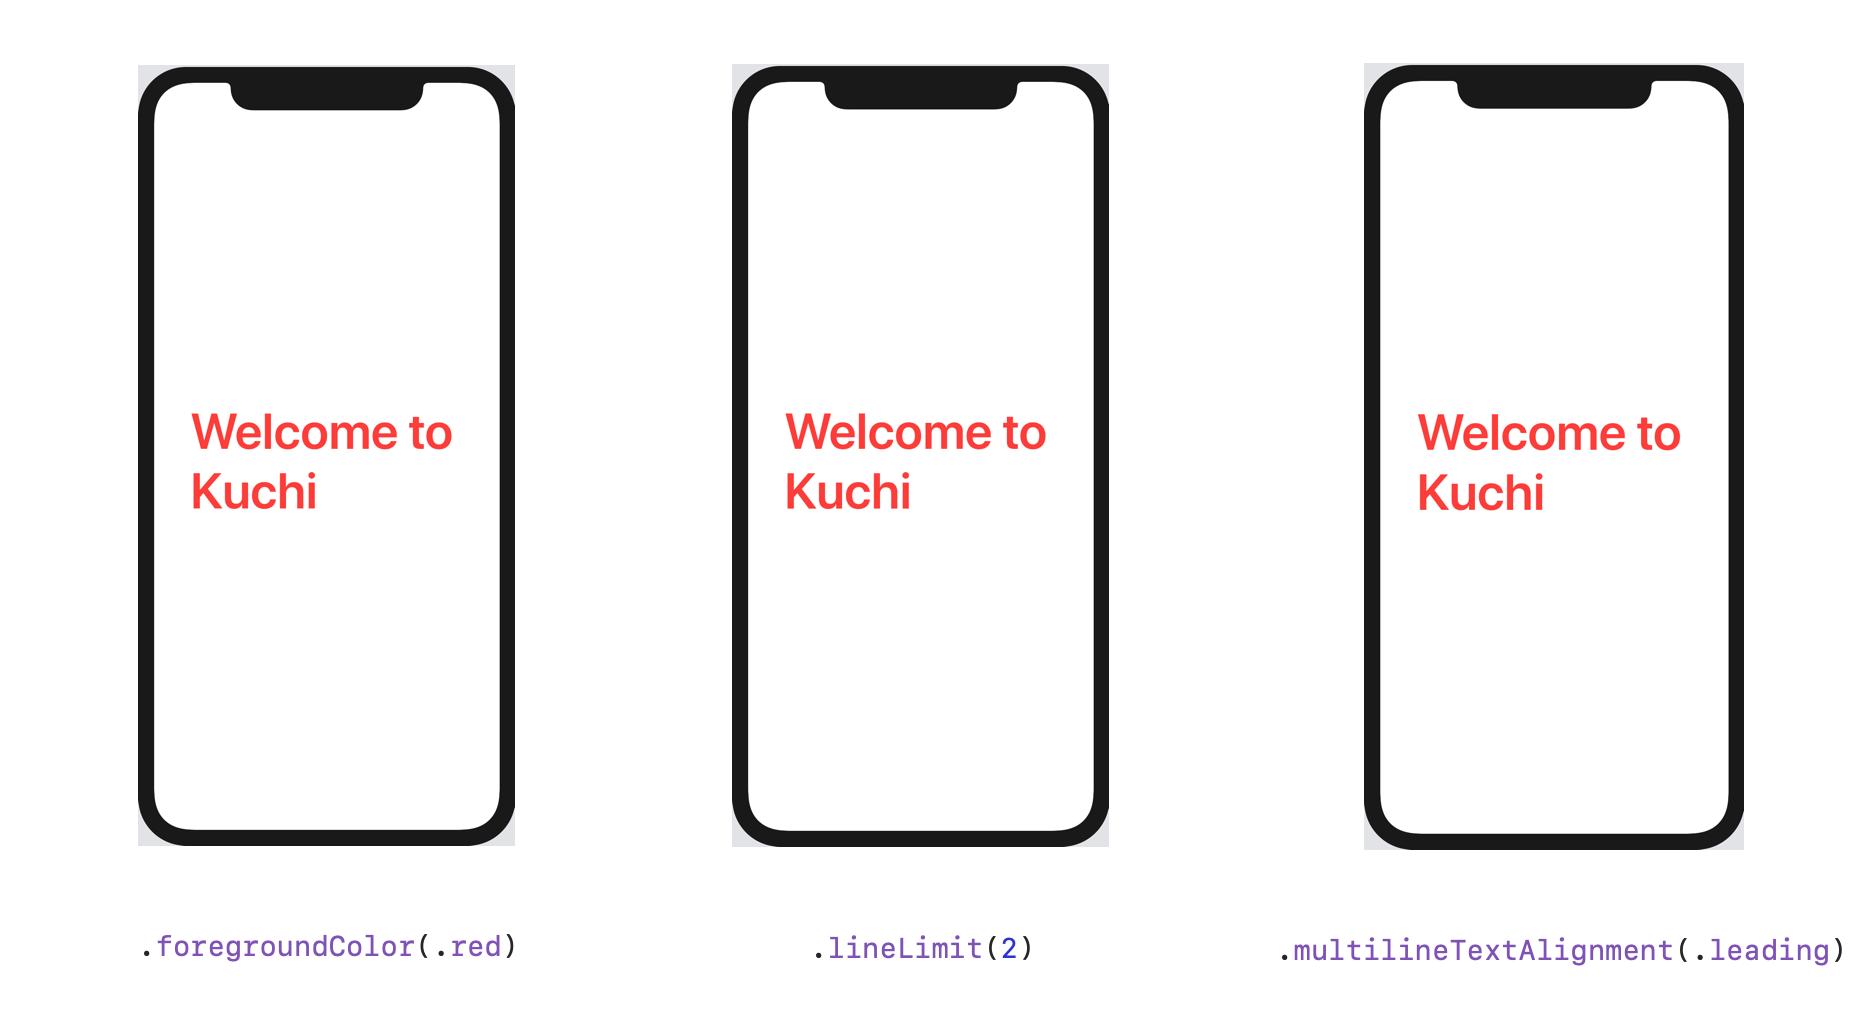 Kuchi Steps 2